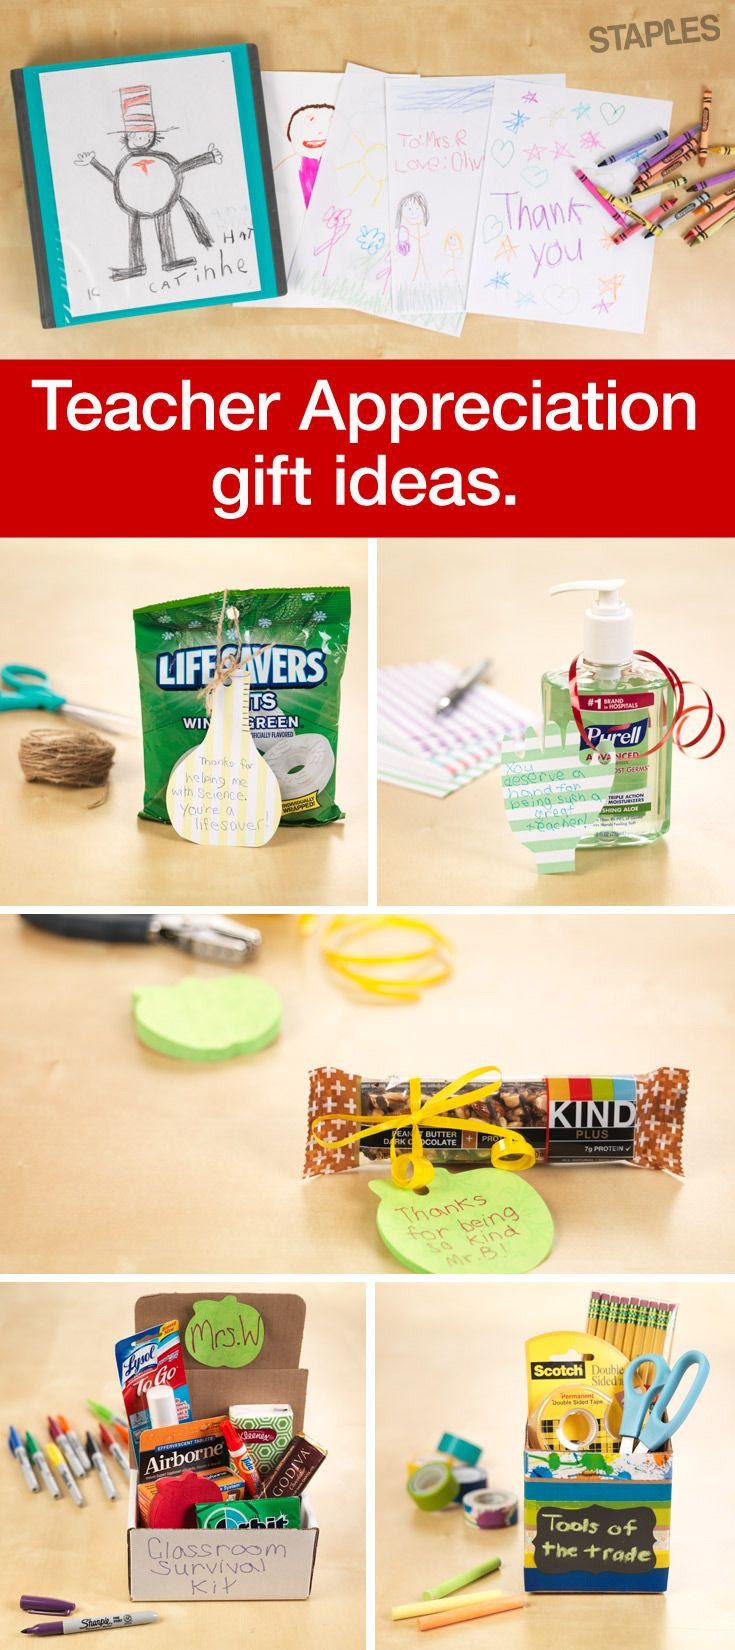 Teacher Appreciation Gifts | Business Hub | Staples.com®